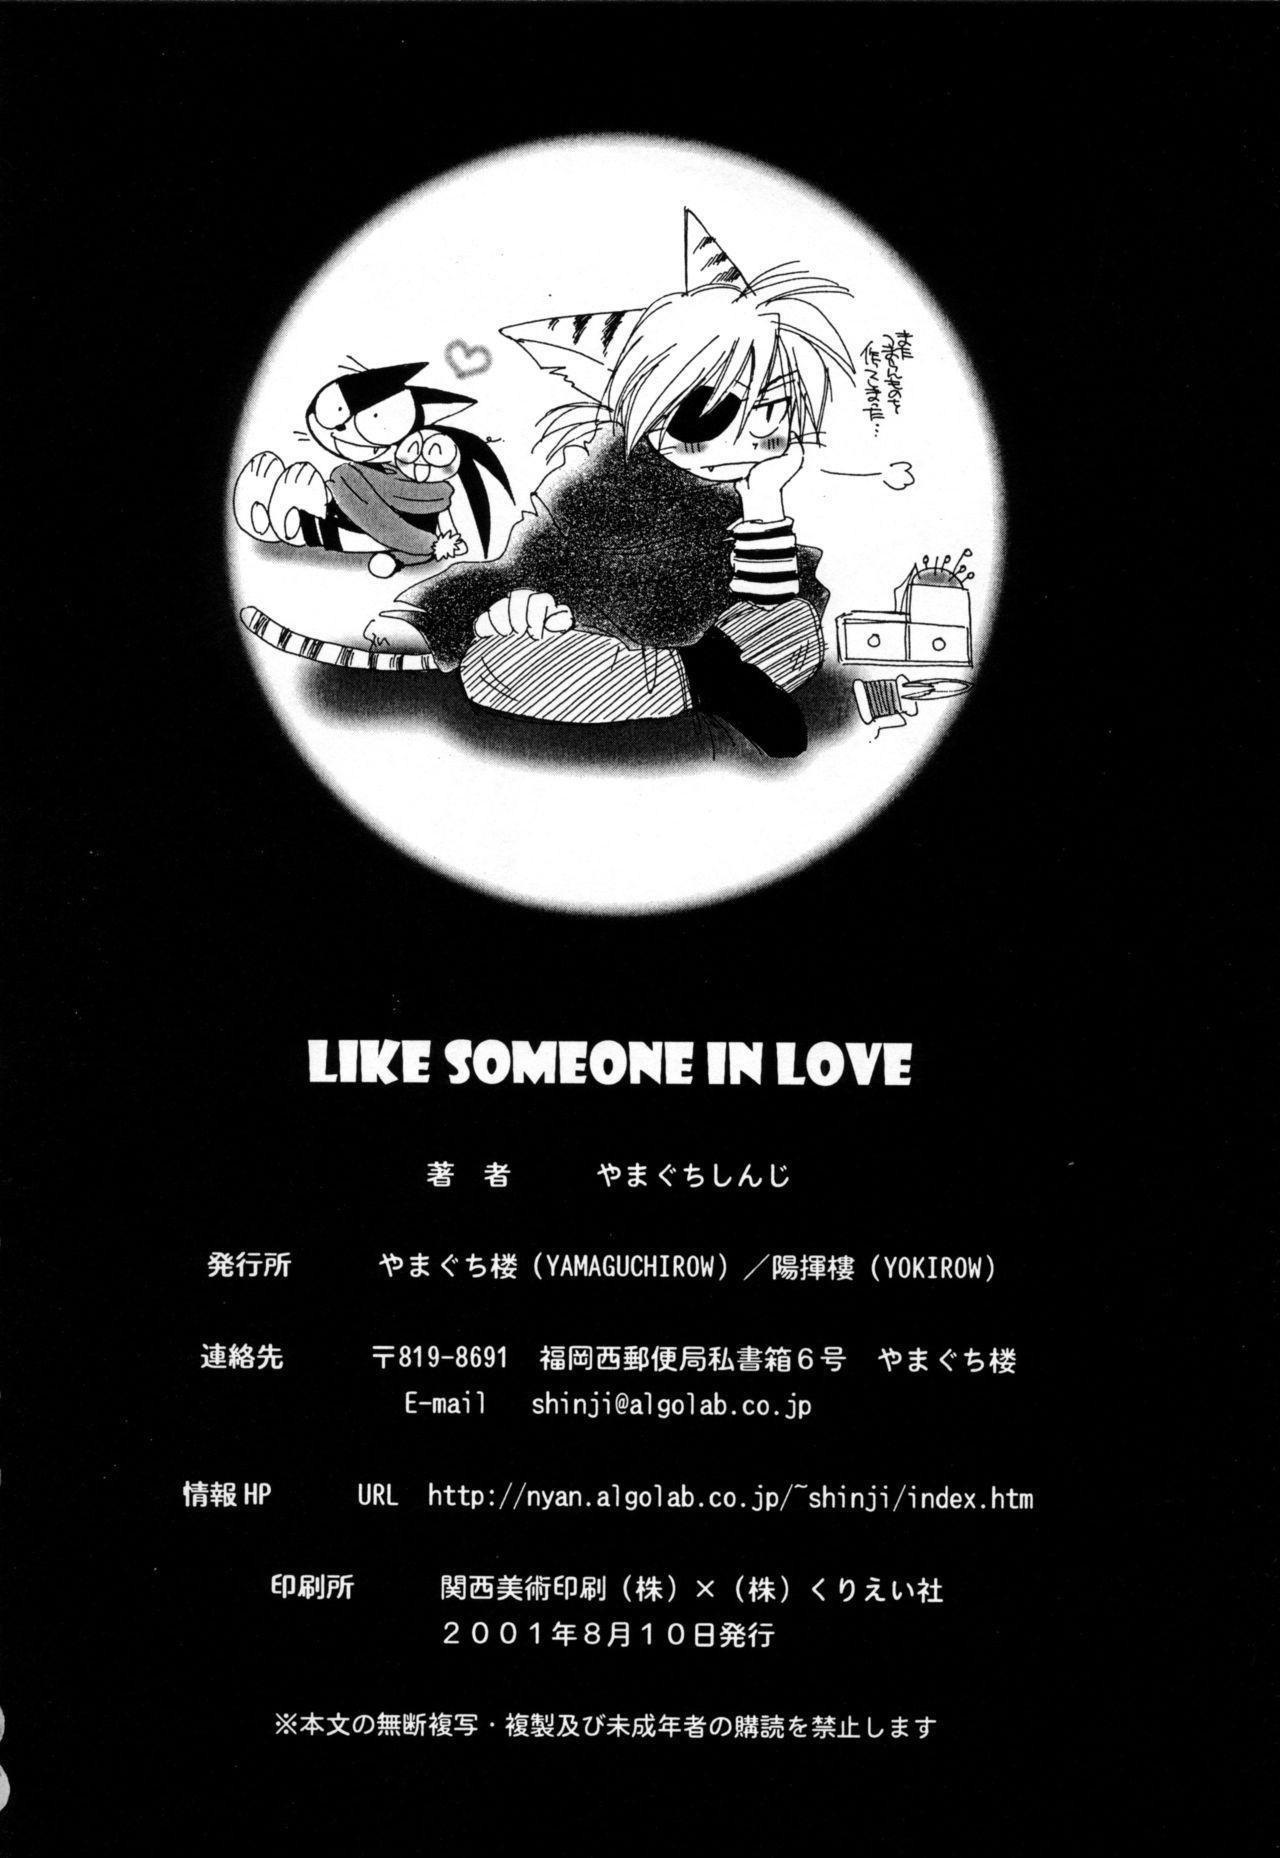 LIKE SOMEONE IN LOVE 20